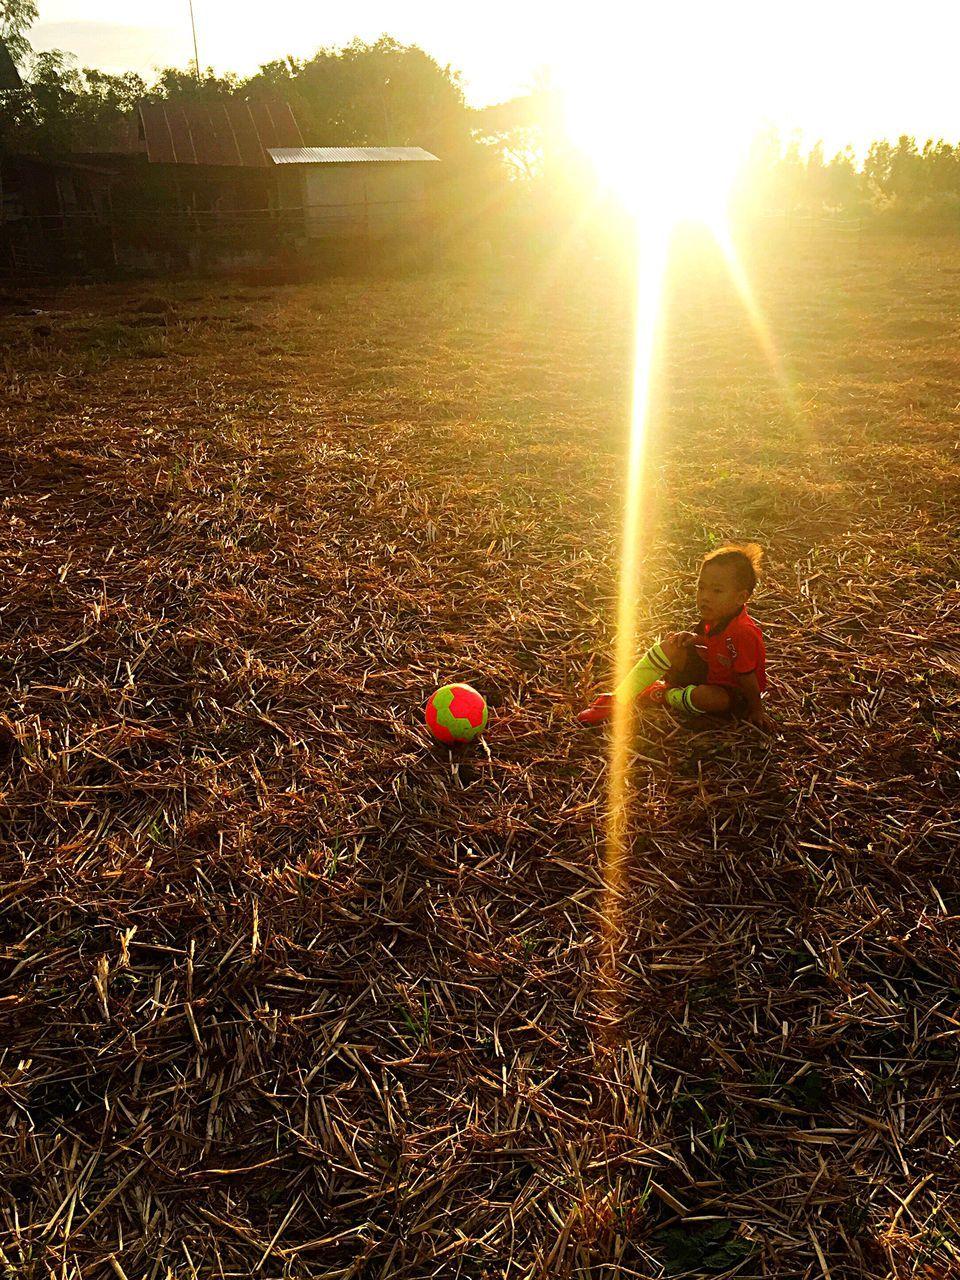 sunlight, lens flare, sunbeam, outdoors, no people, sun, nature, day